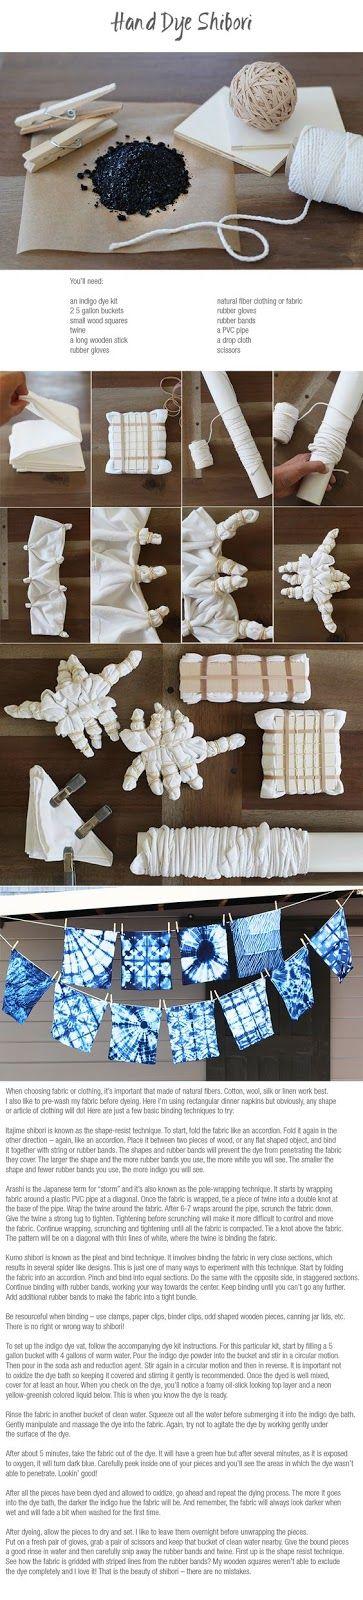 Collettivo Roxland (RdC Creations Italia): Art batik (Shibori- Tie dye)